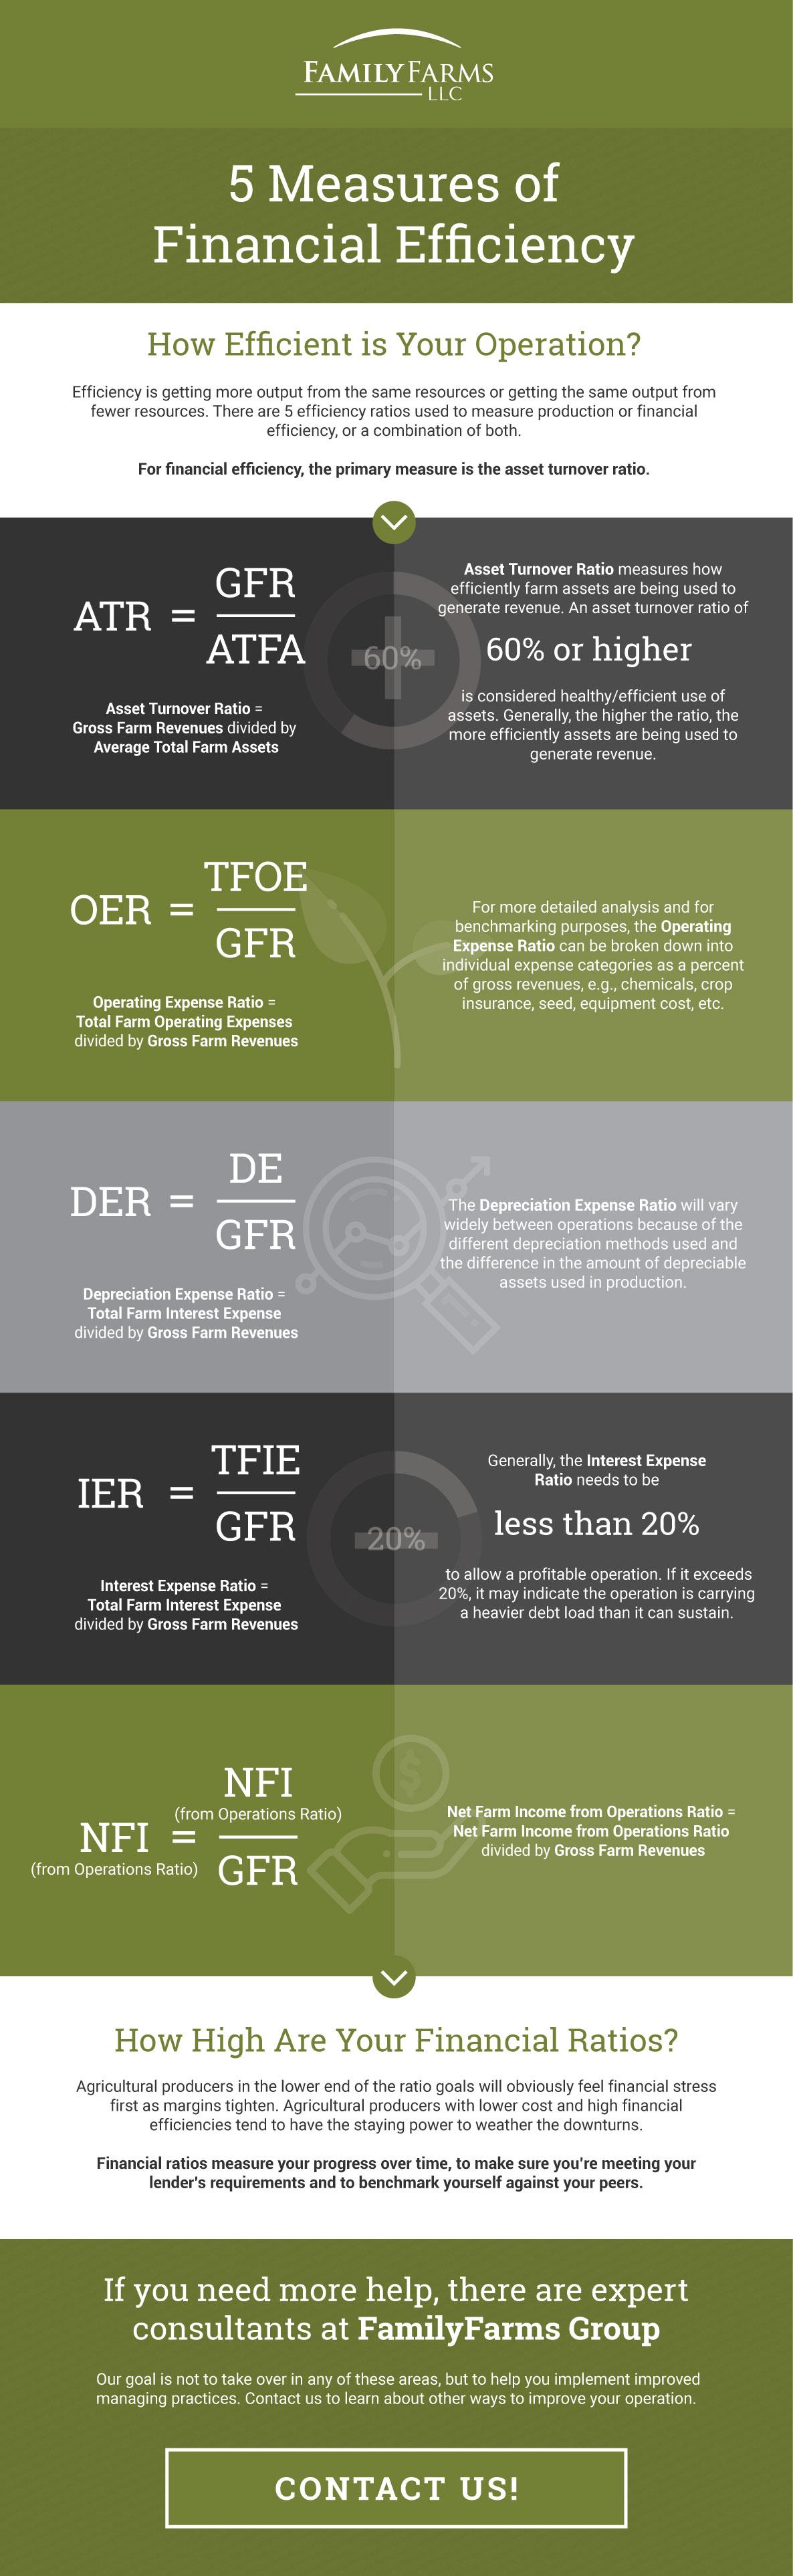 5-Measures-of-Financial-Efficiency